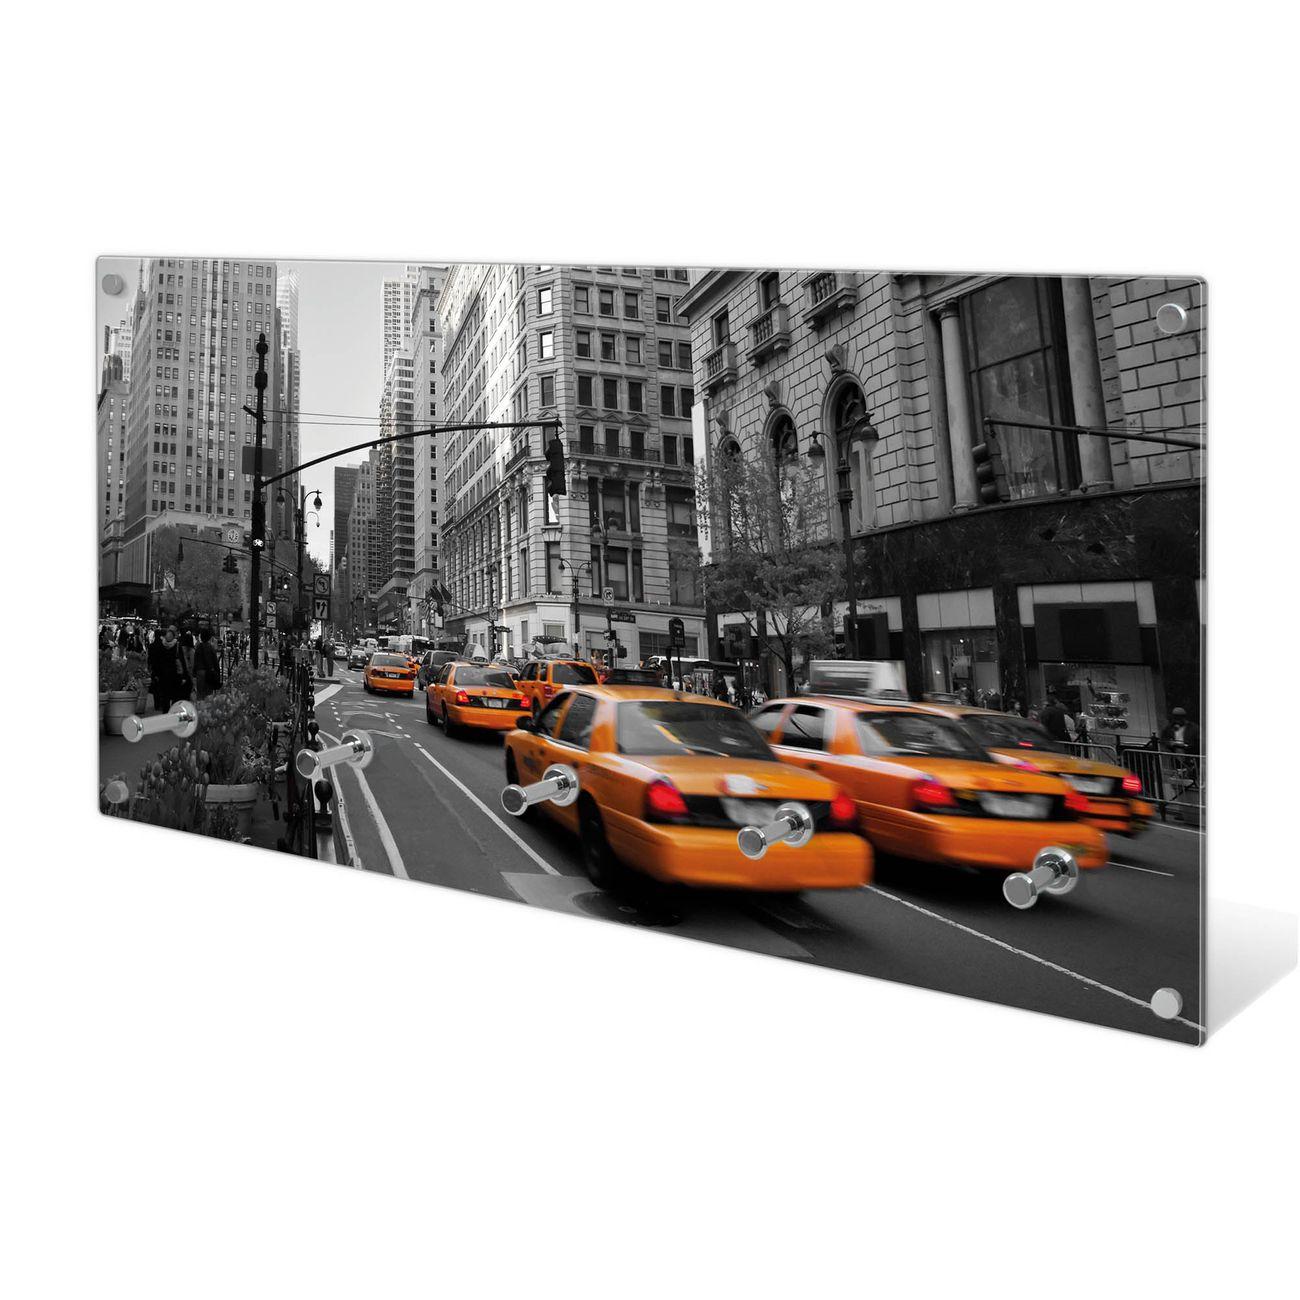 Garderobe aus Glas Motiv New York Taxi